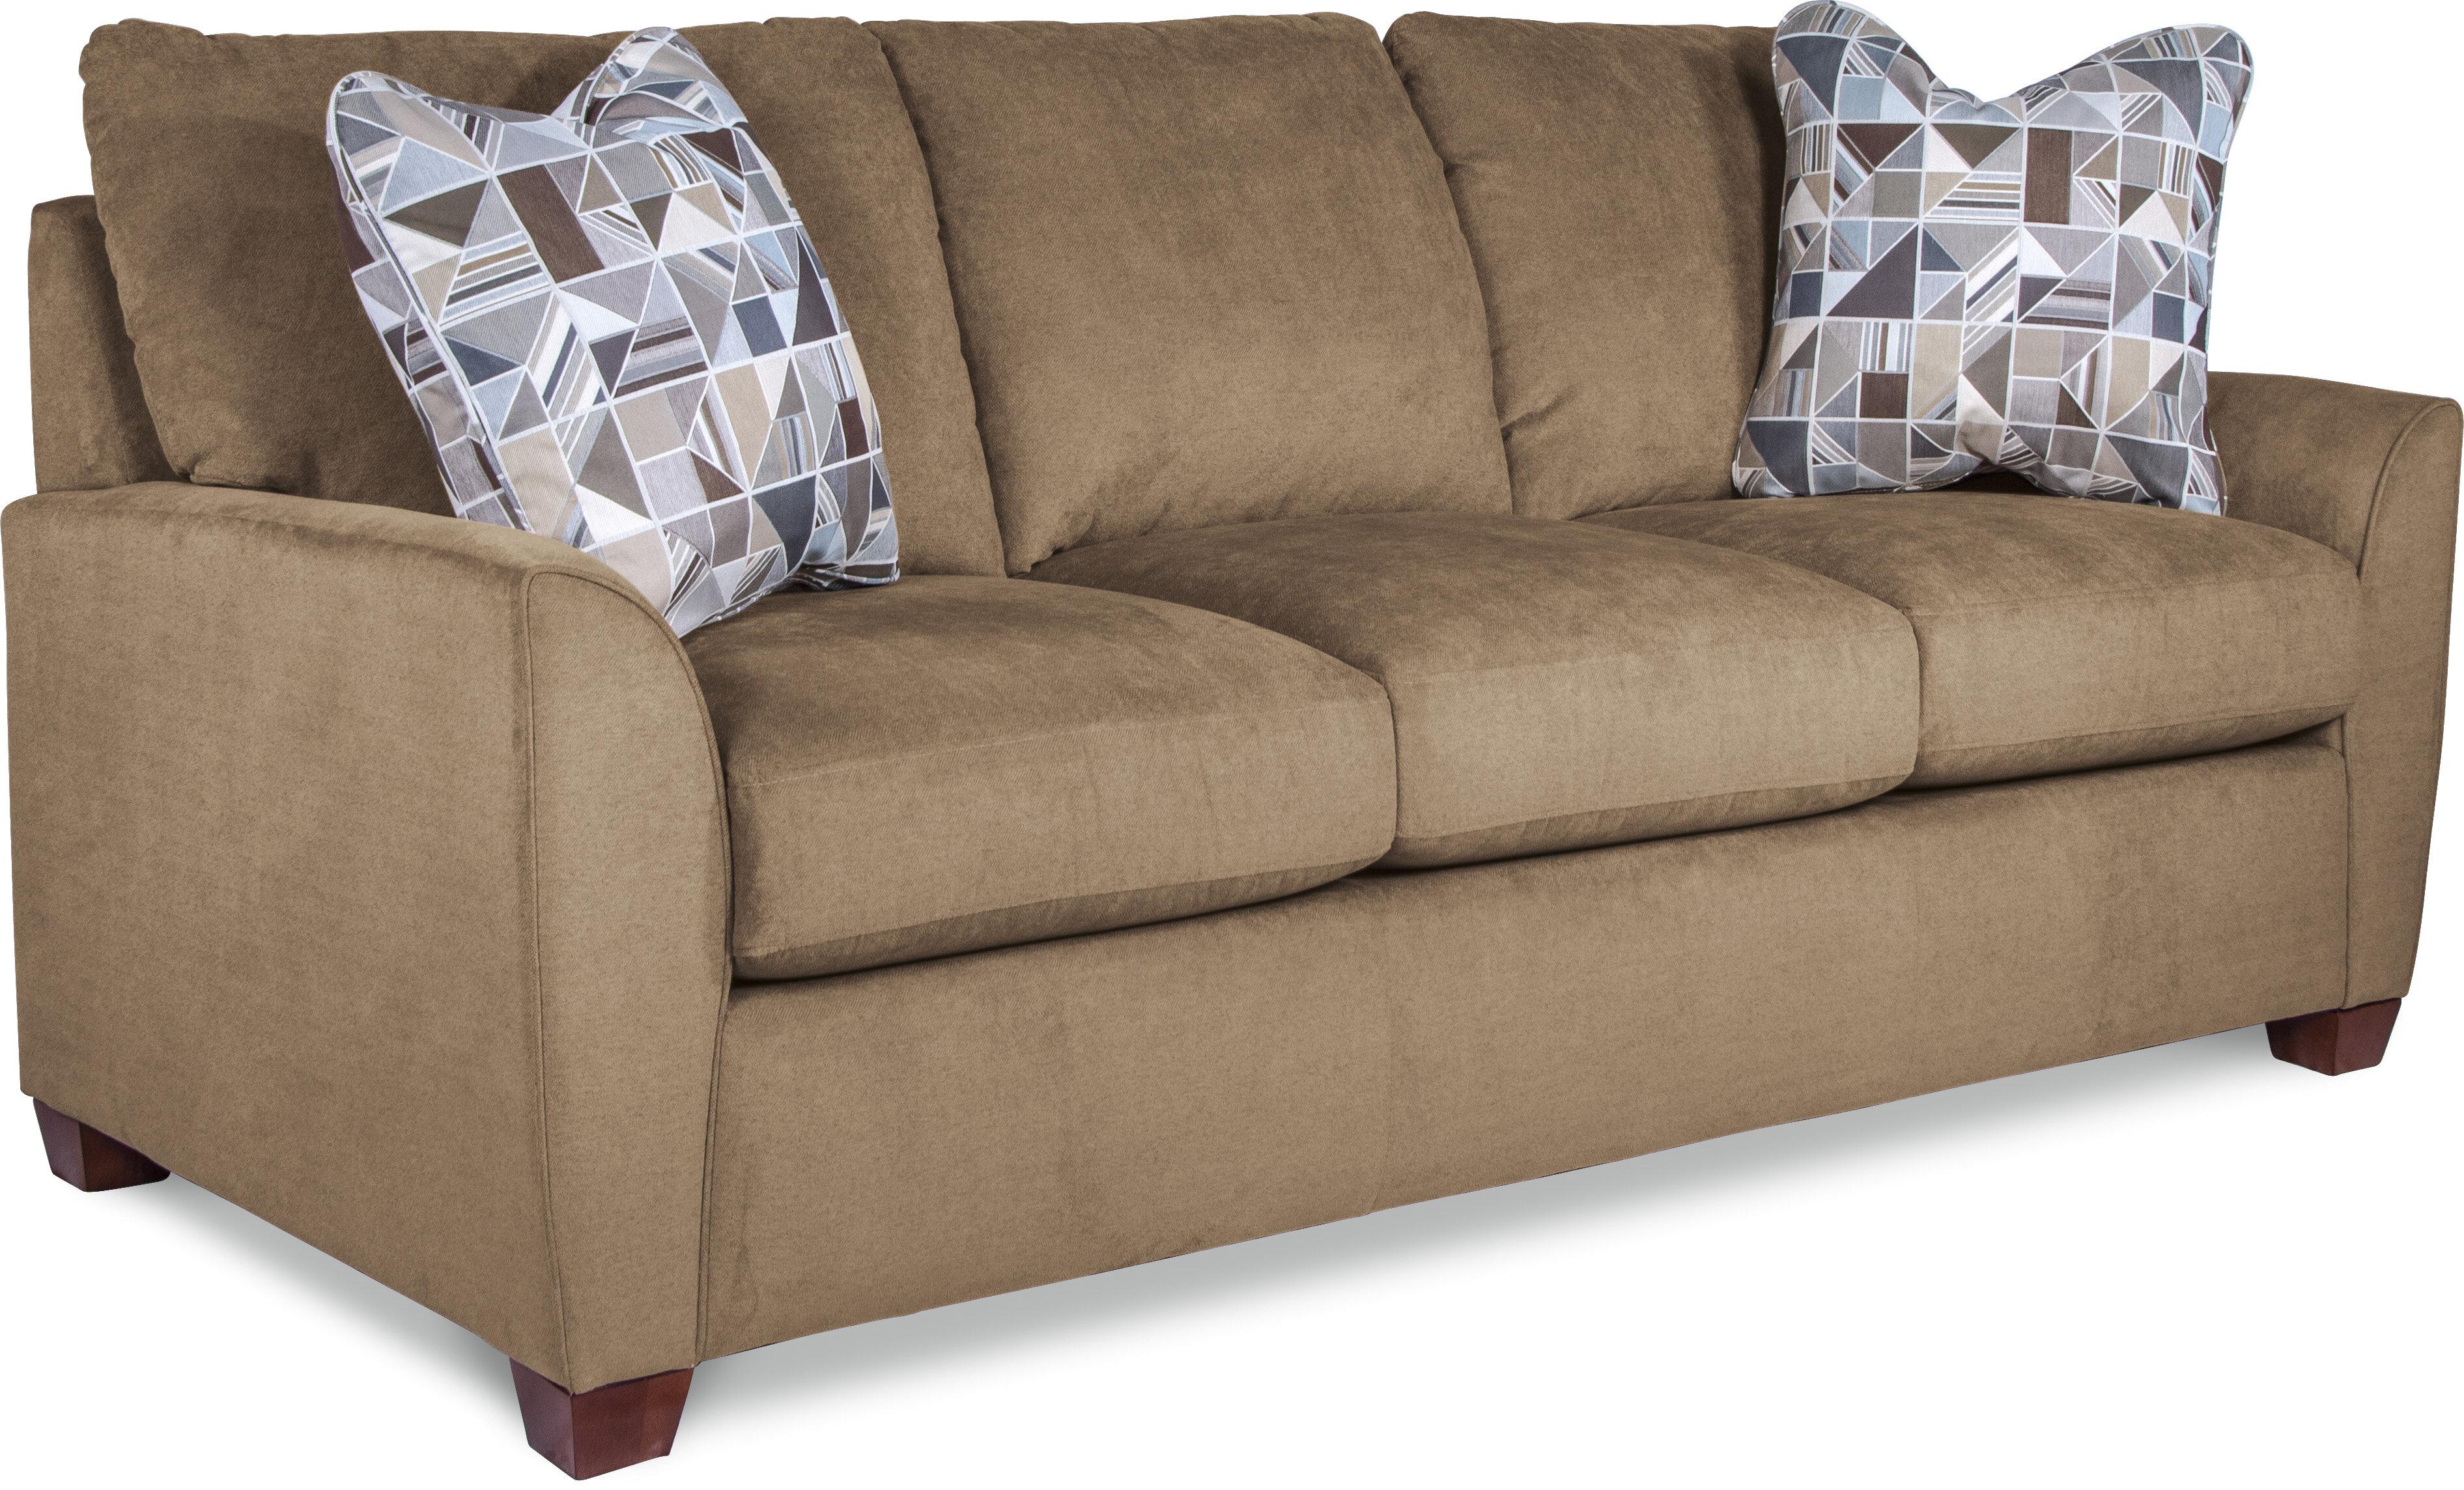 La-Z-Boy Amy Premier Supreme-Comfort Sleeper Sofa & Reviews | Wayfair